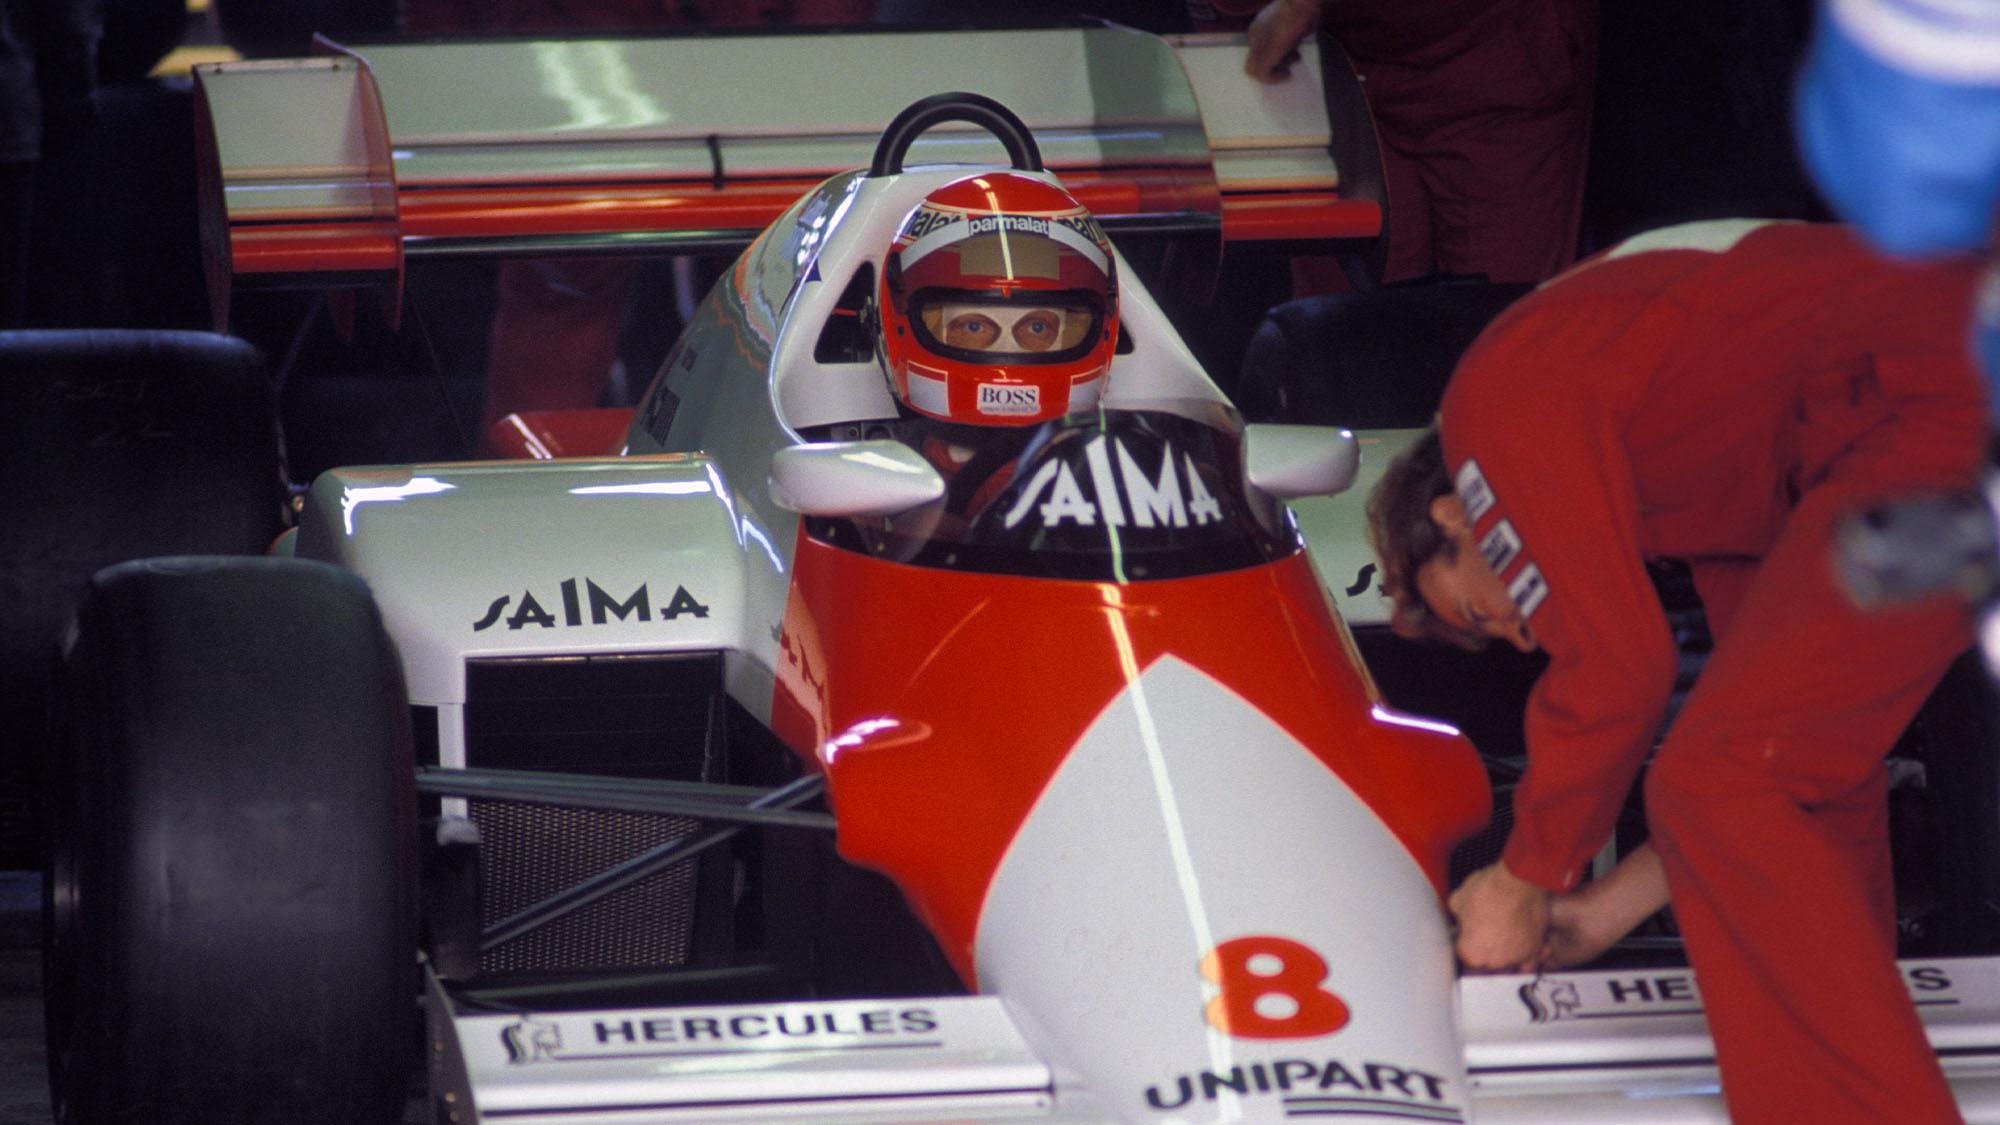 Niki Lauda McLaren